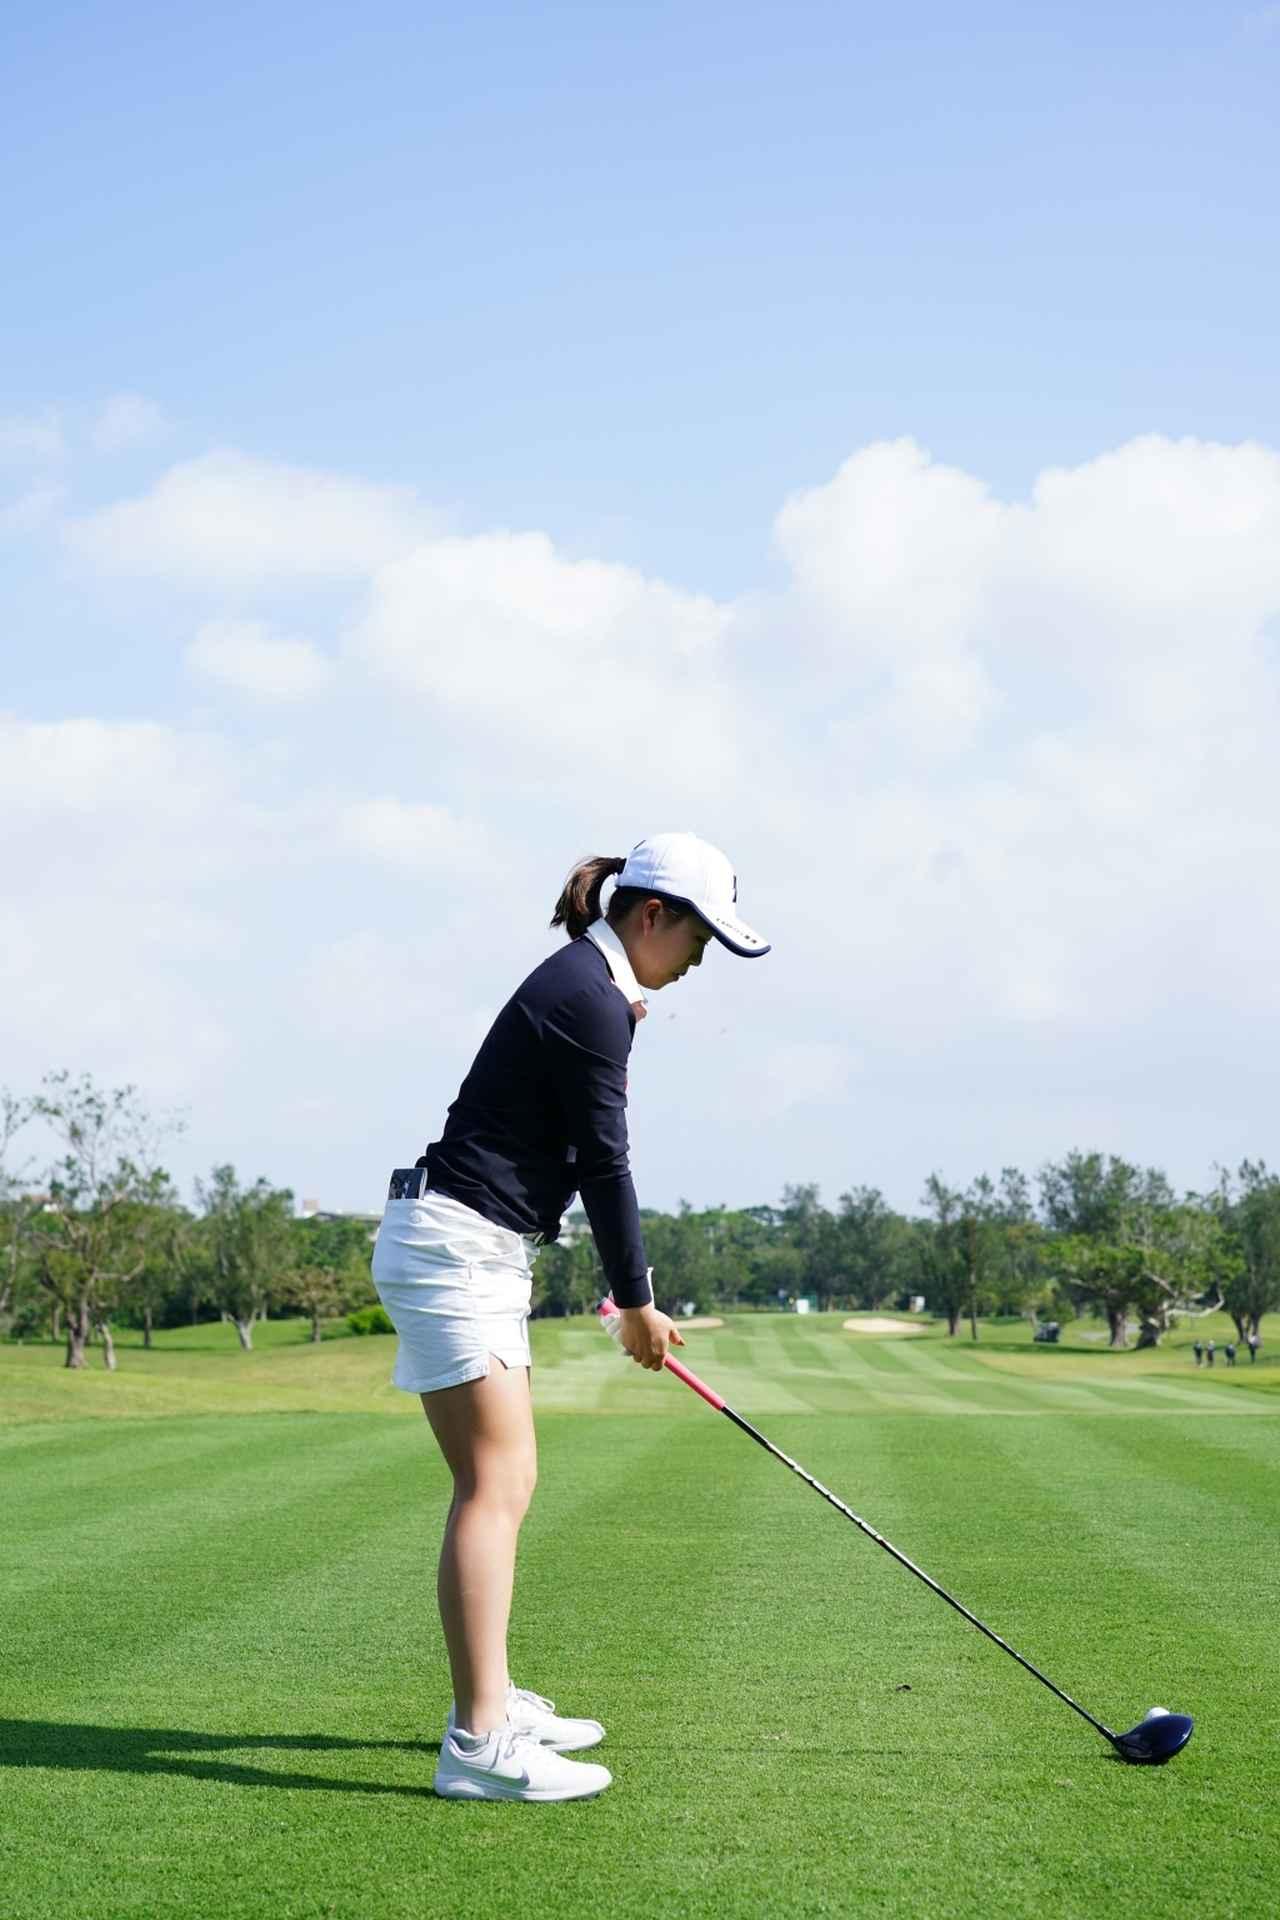 Images : 1番目の画像 - 丹萌乃のドライバー連続写真 - みんなのゴルフダイジェスト